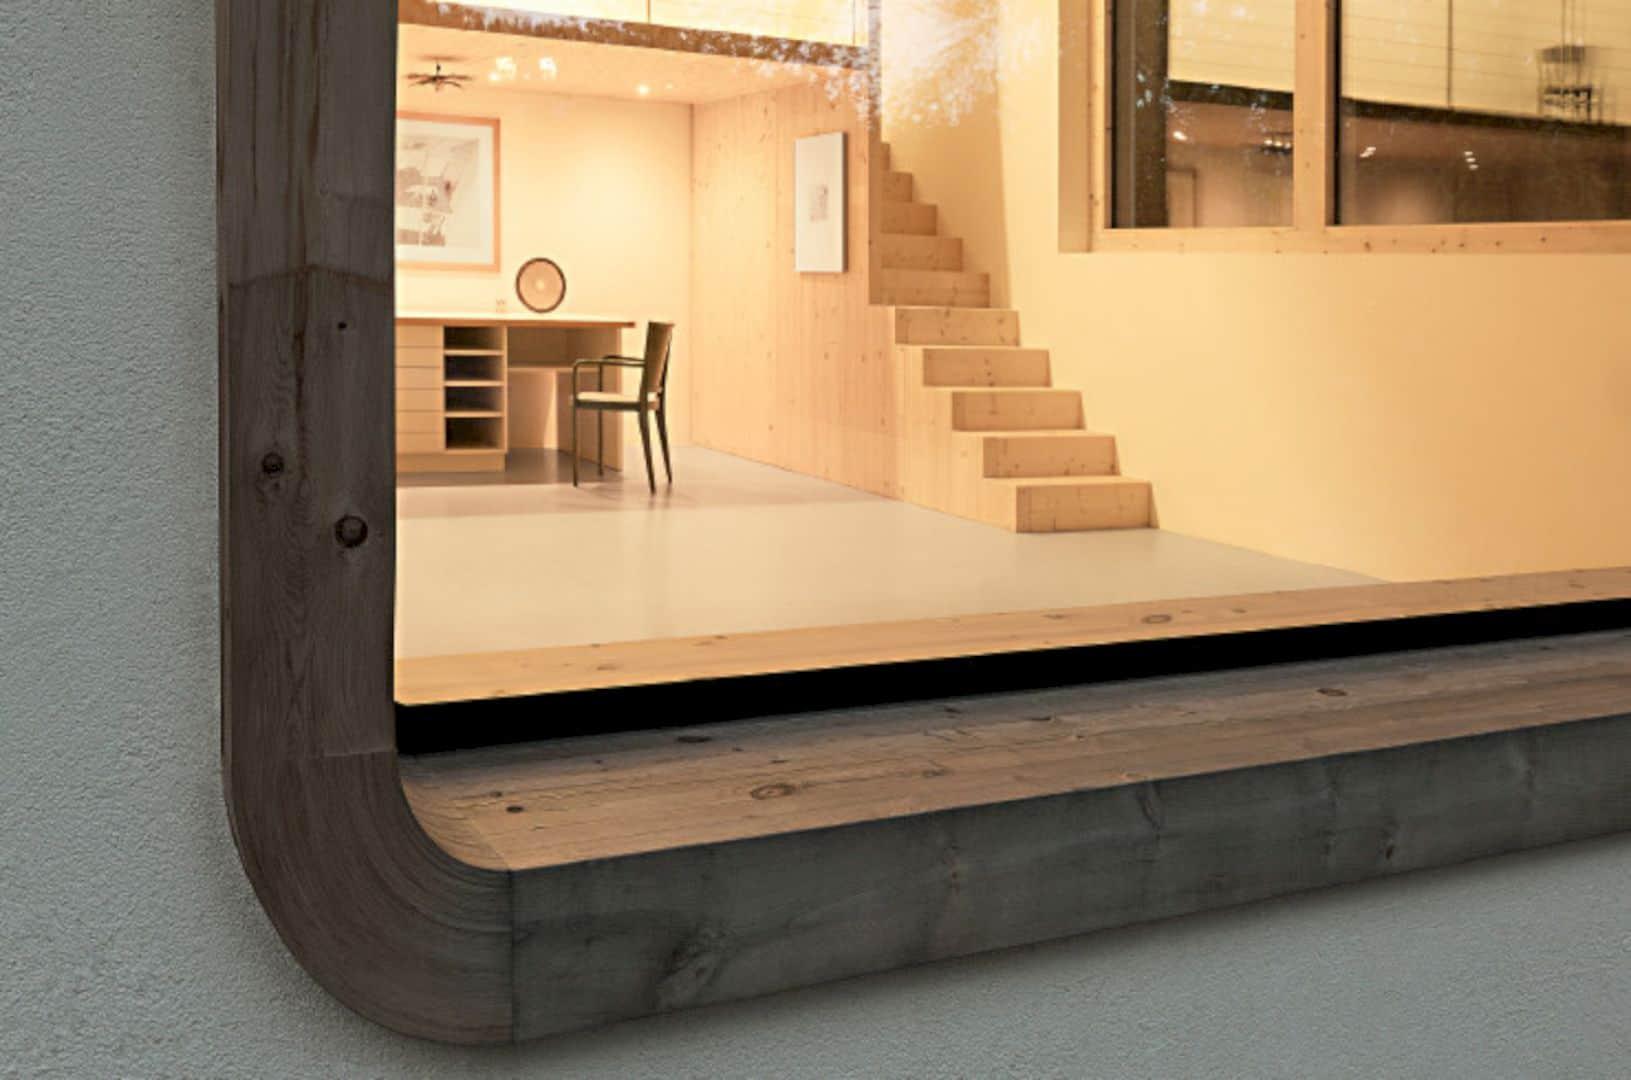 Studio Franz Messner Renovation 3